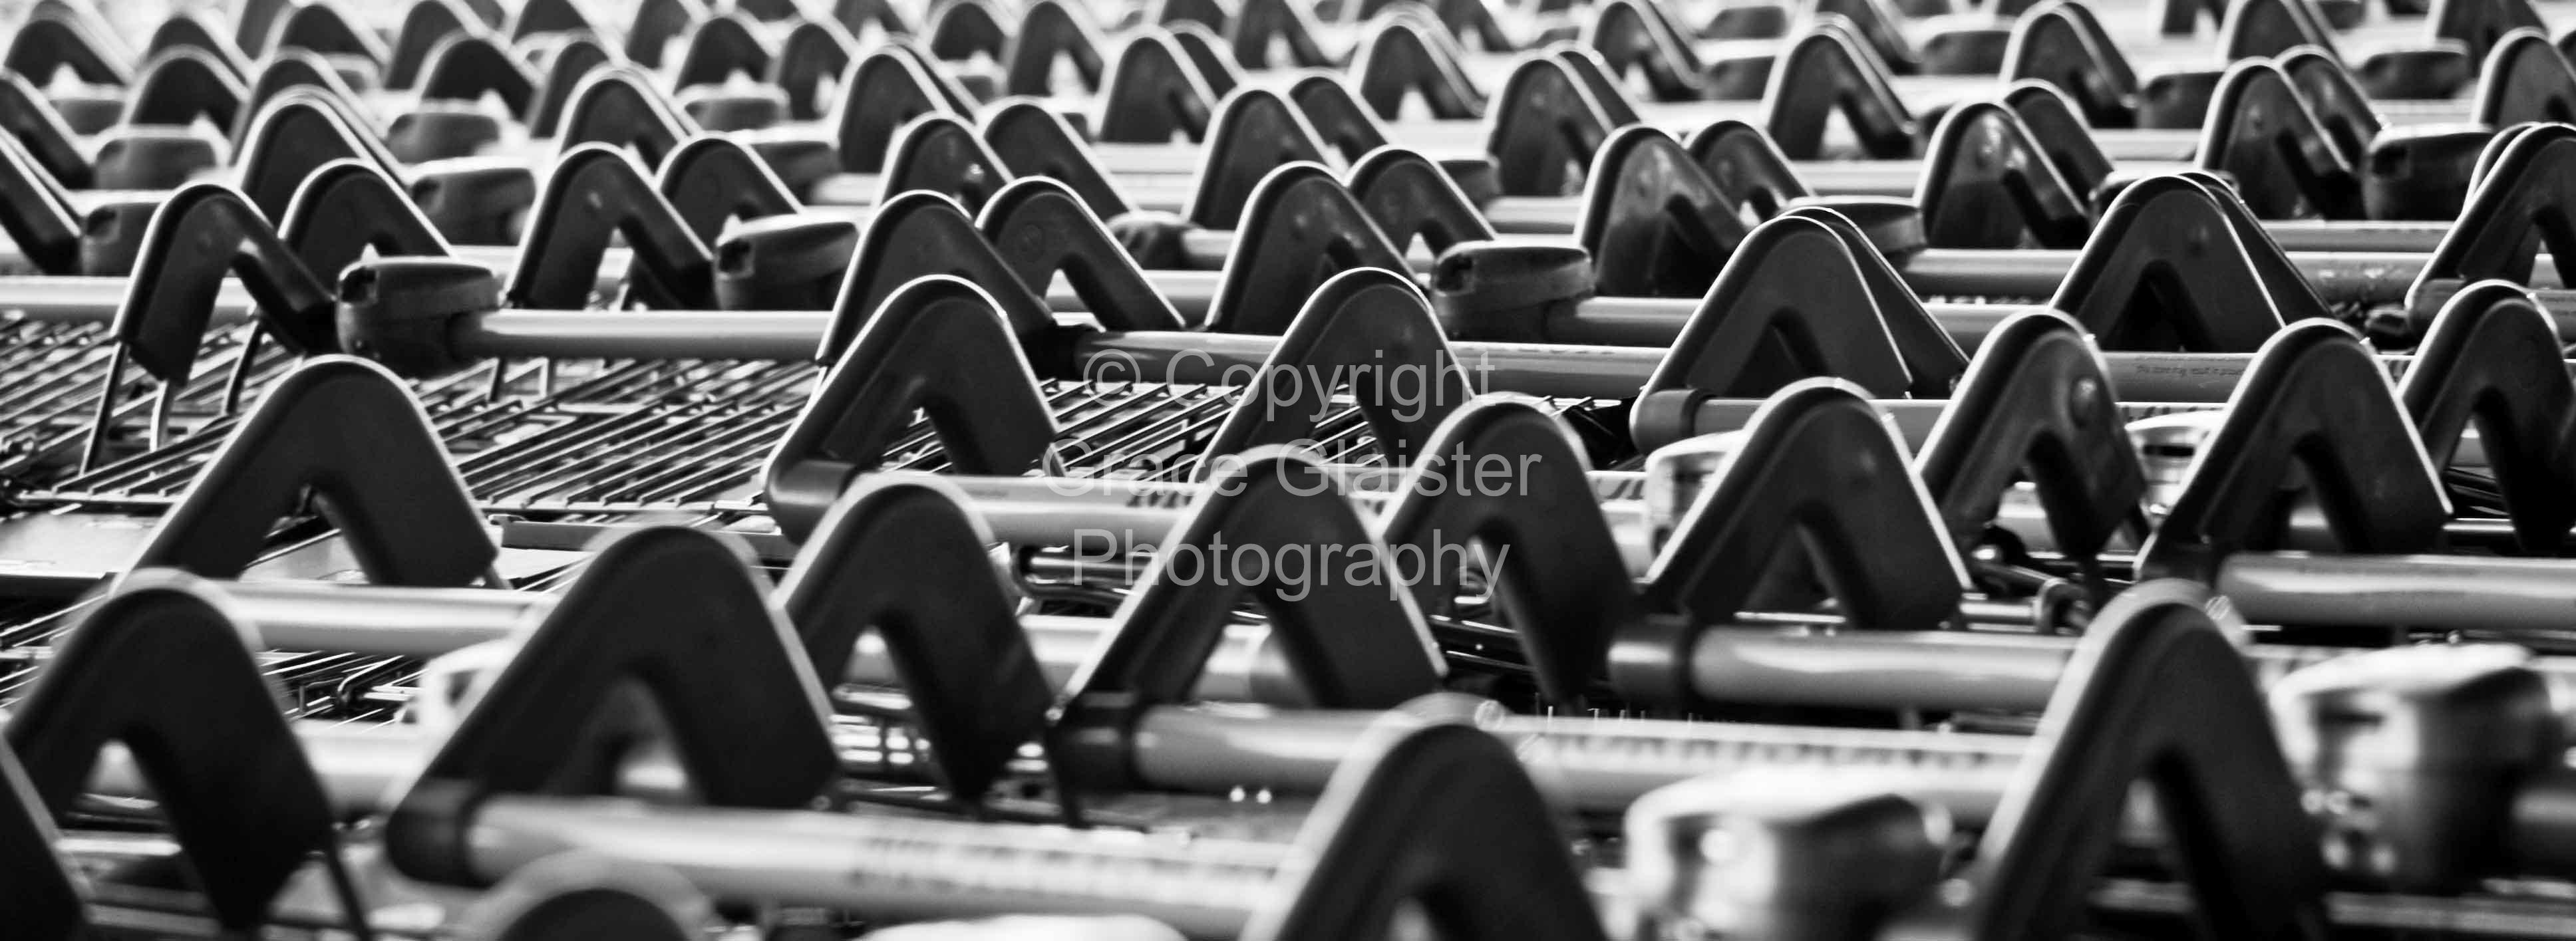 Trolleys by Grace Glaister